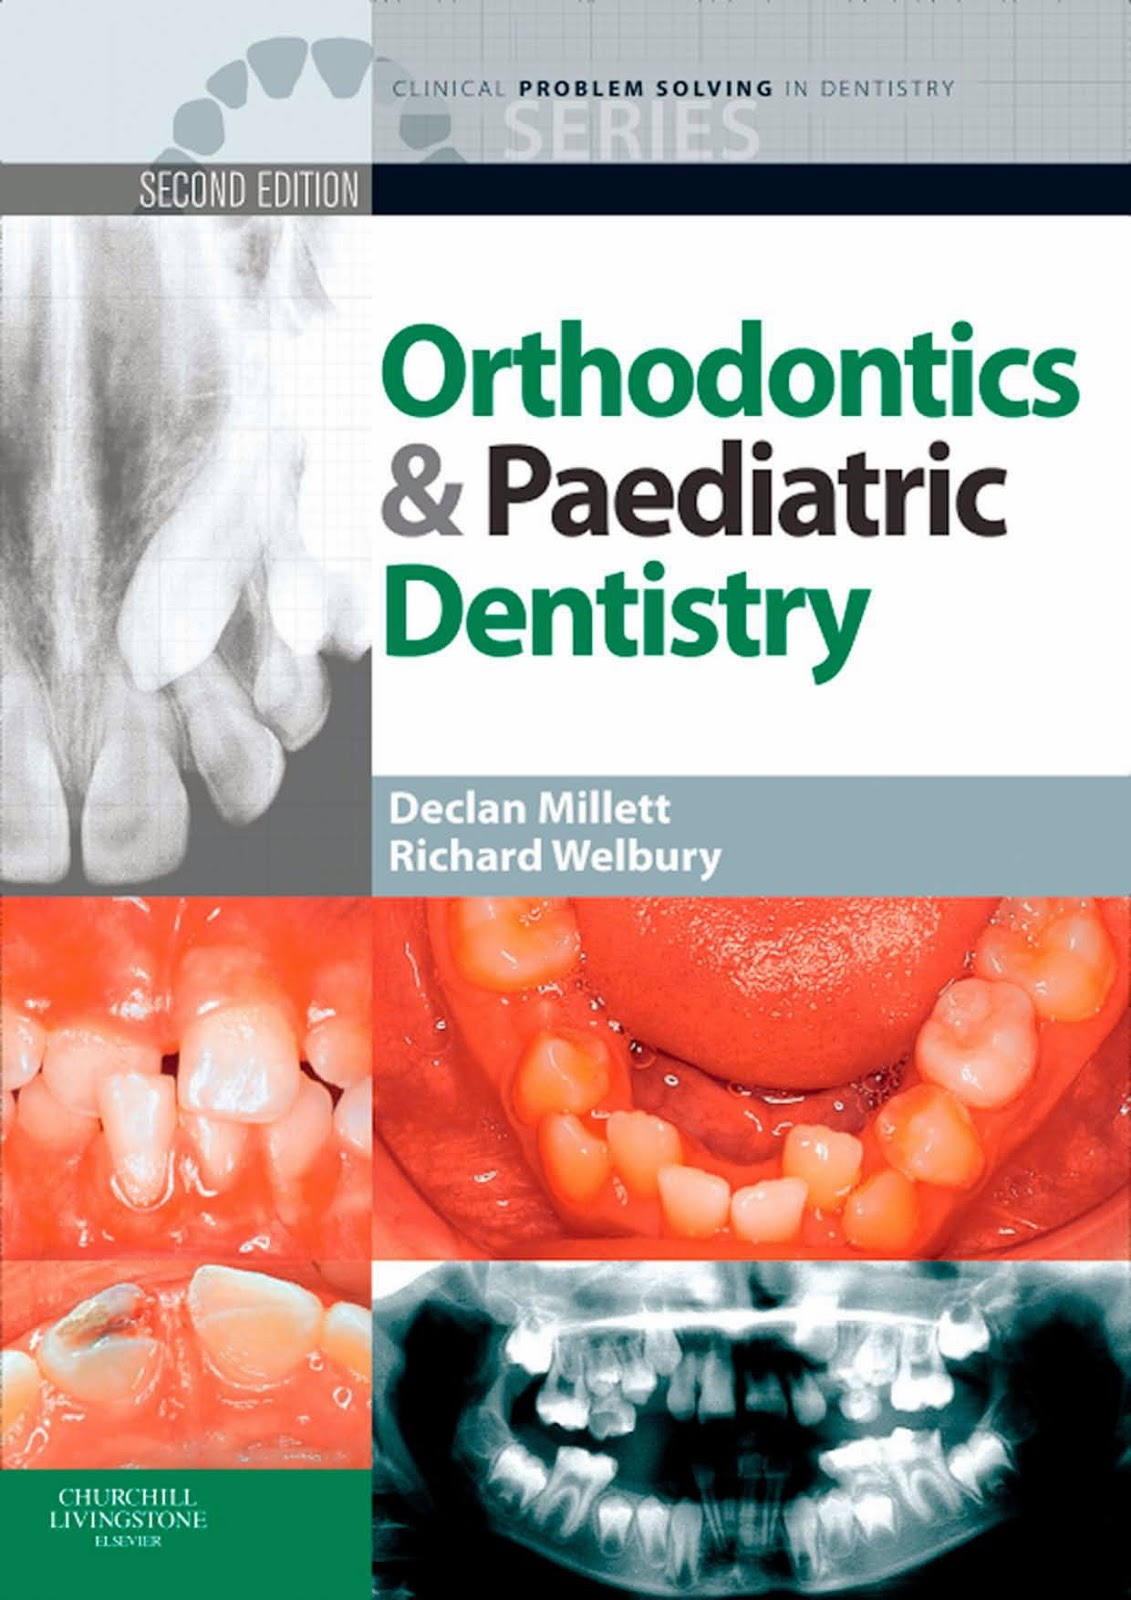 Clinical Problem Solving in Dentistry ....  Orthodontics& Paediatric Dentistry - Declan Millett,Richard Welbury,Caroline Campbell -  .2nd ed © 2010.PD